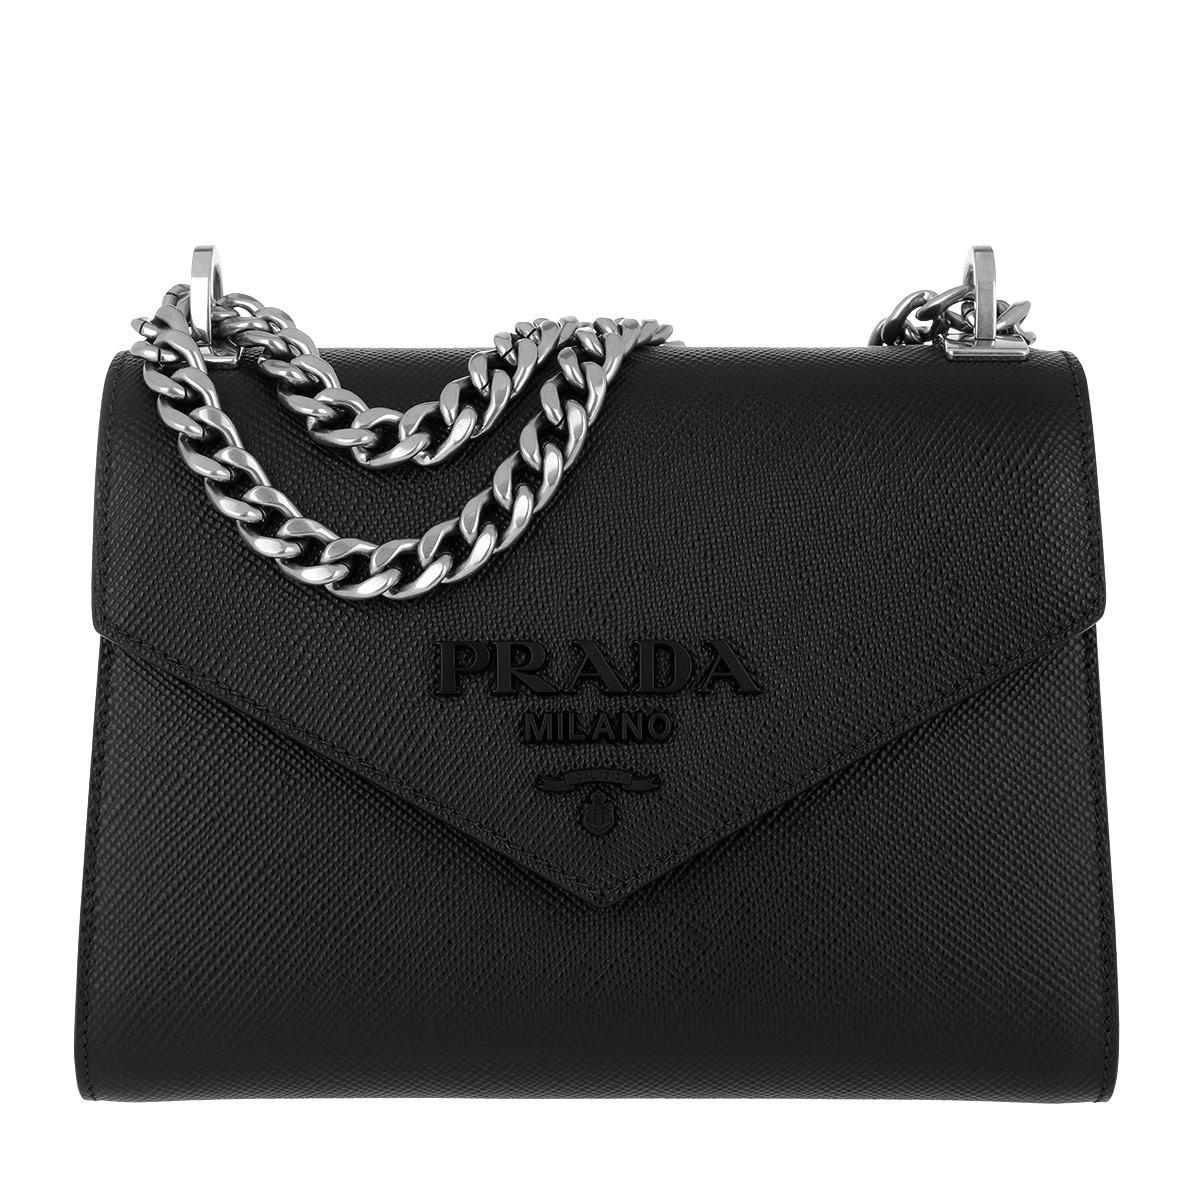 322c739151c4 Prada Monochrome Crossbody Bag Medium Nero in Black - Save 16% - Lyst